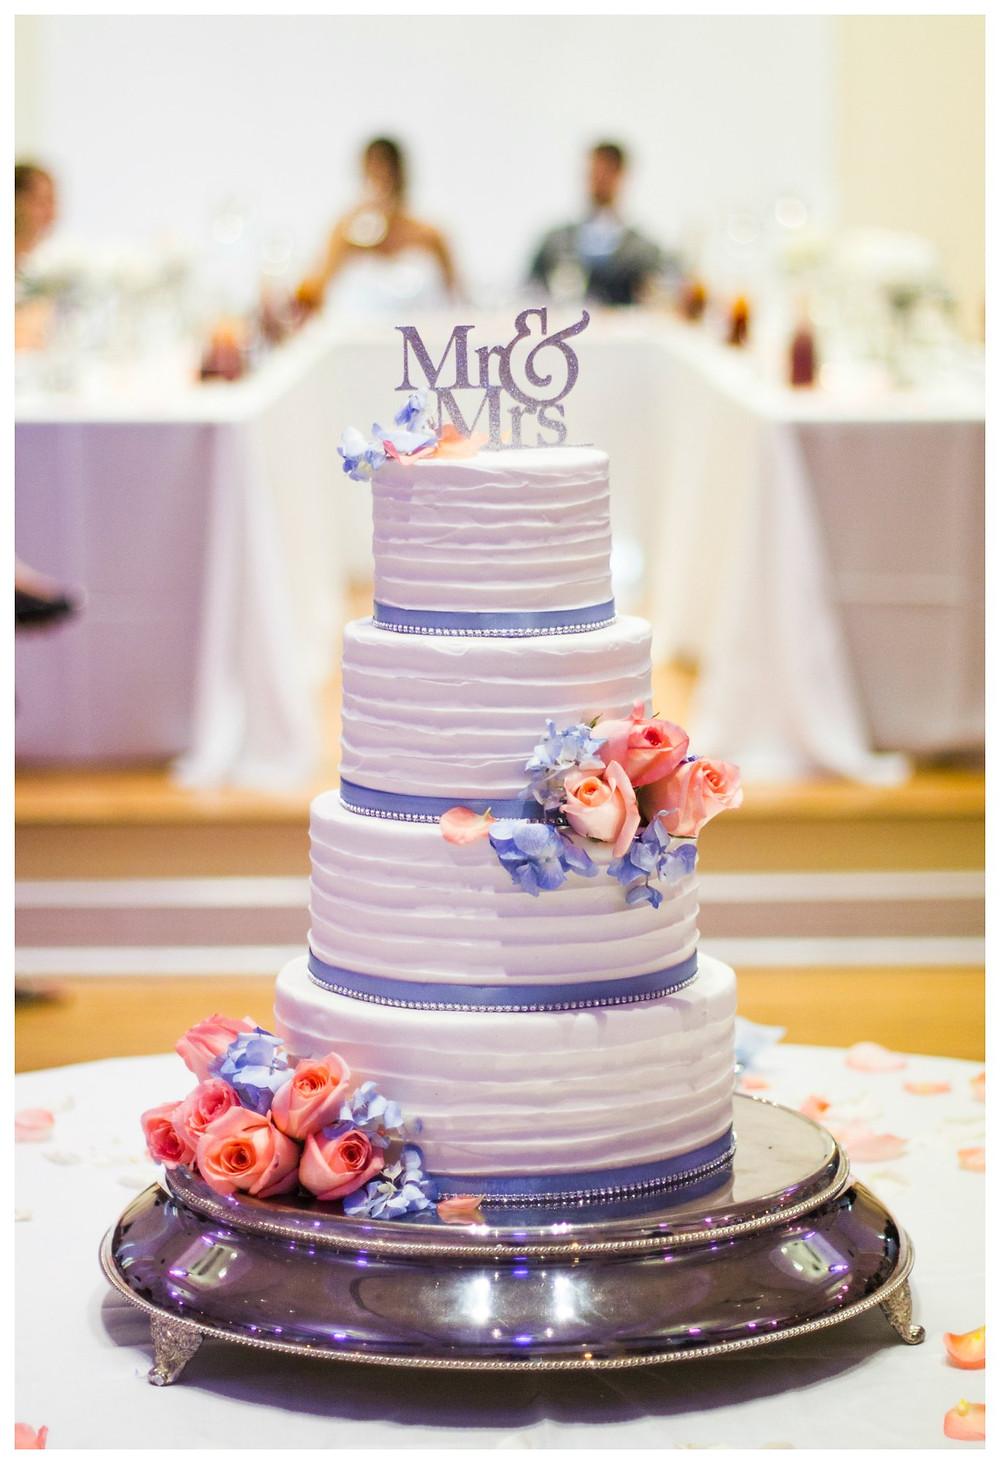 wedding cake blue ribbon pink roses 4 tier columbia mo missouri wedding photographer photography decor